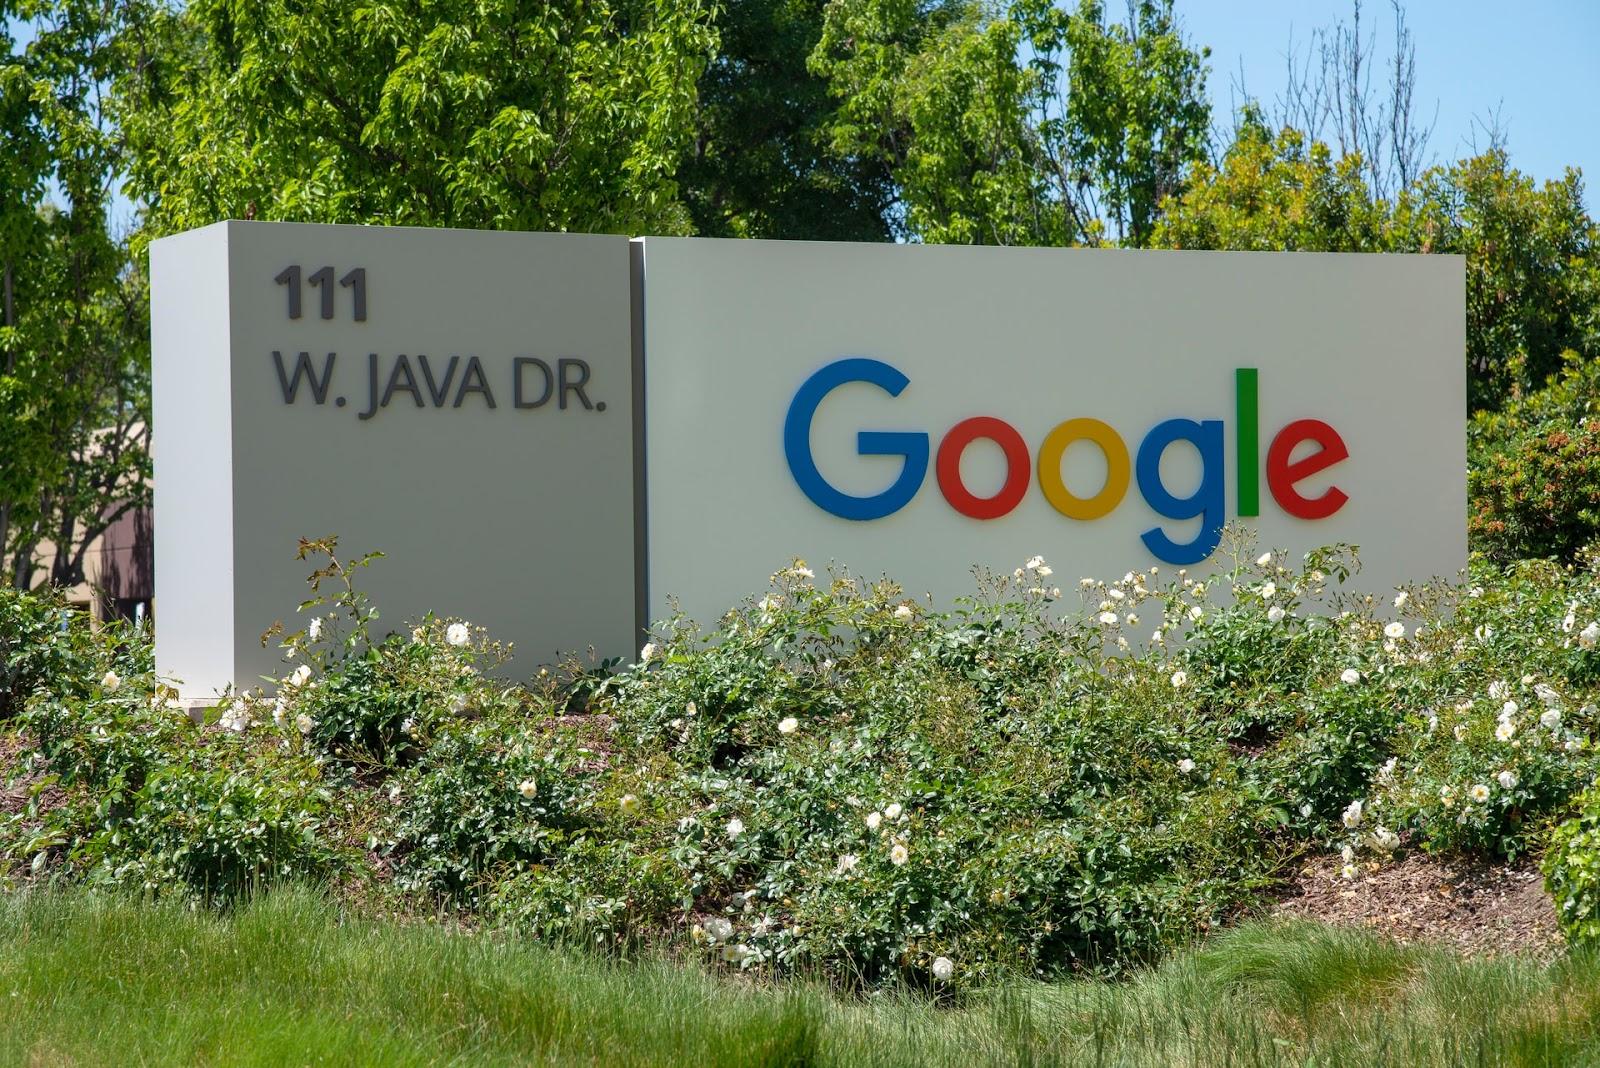 Photo of Google 111 W Java Dr location